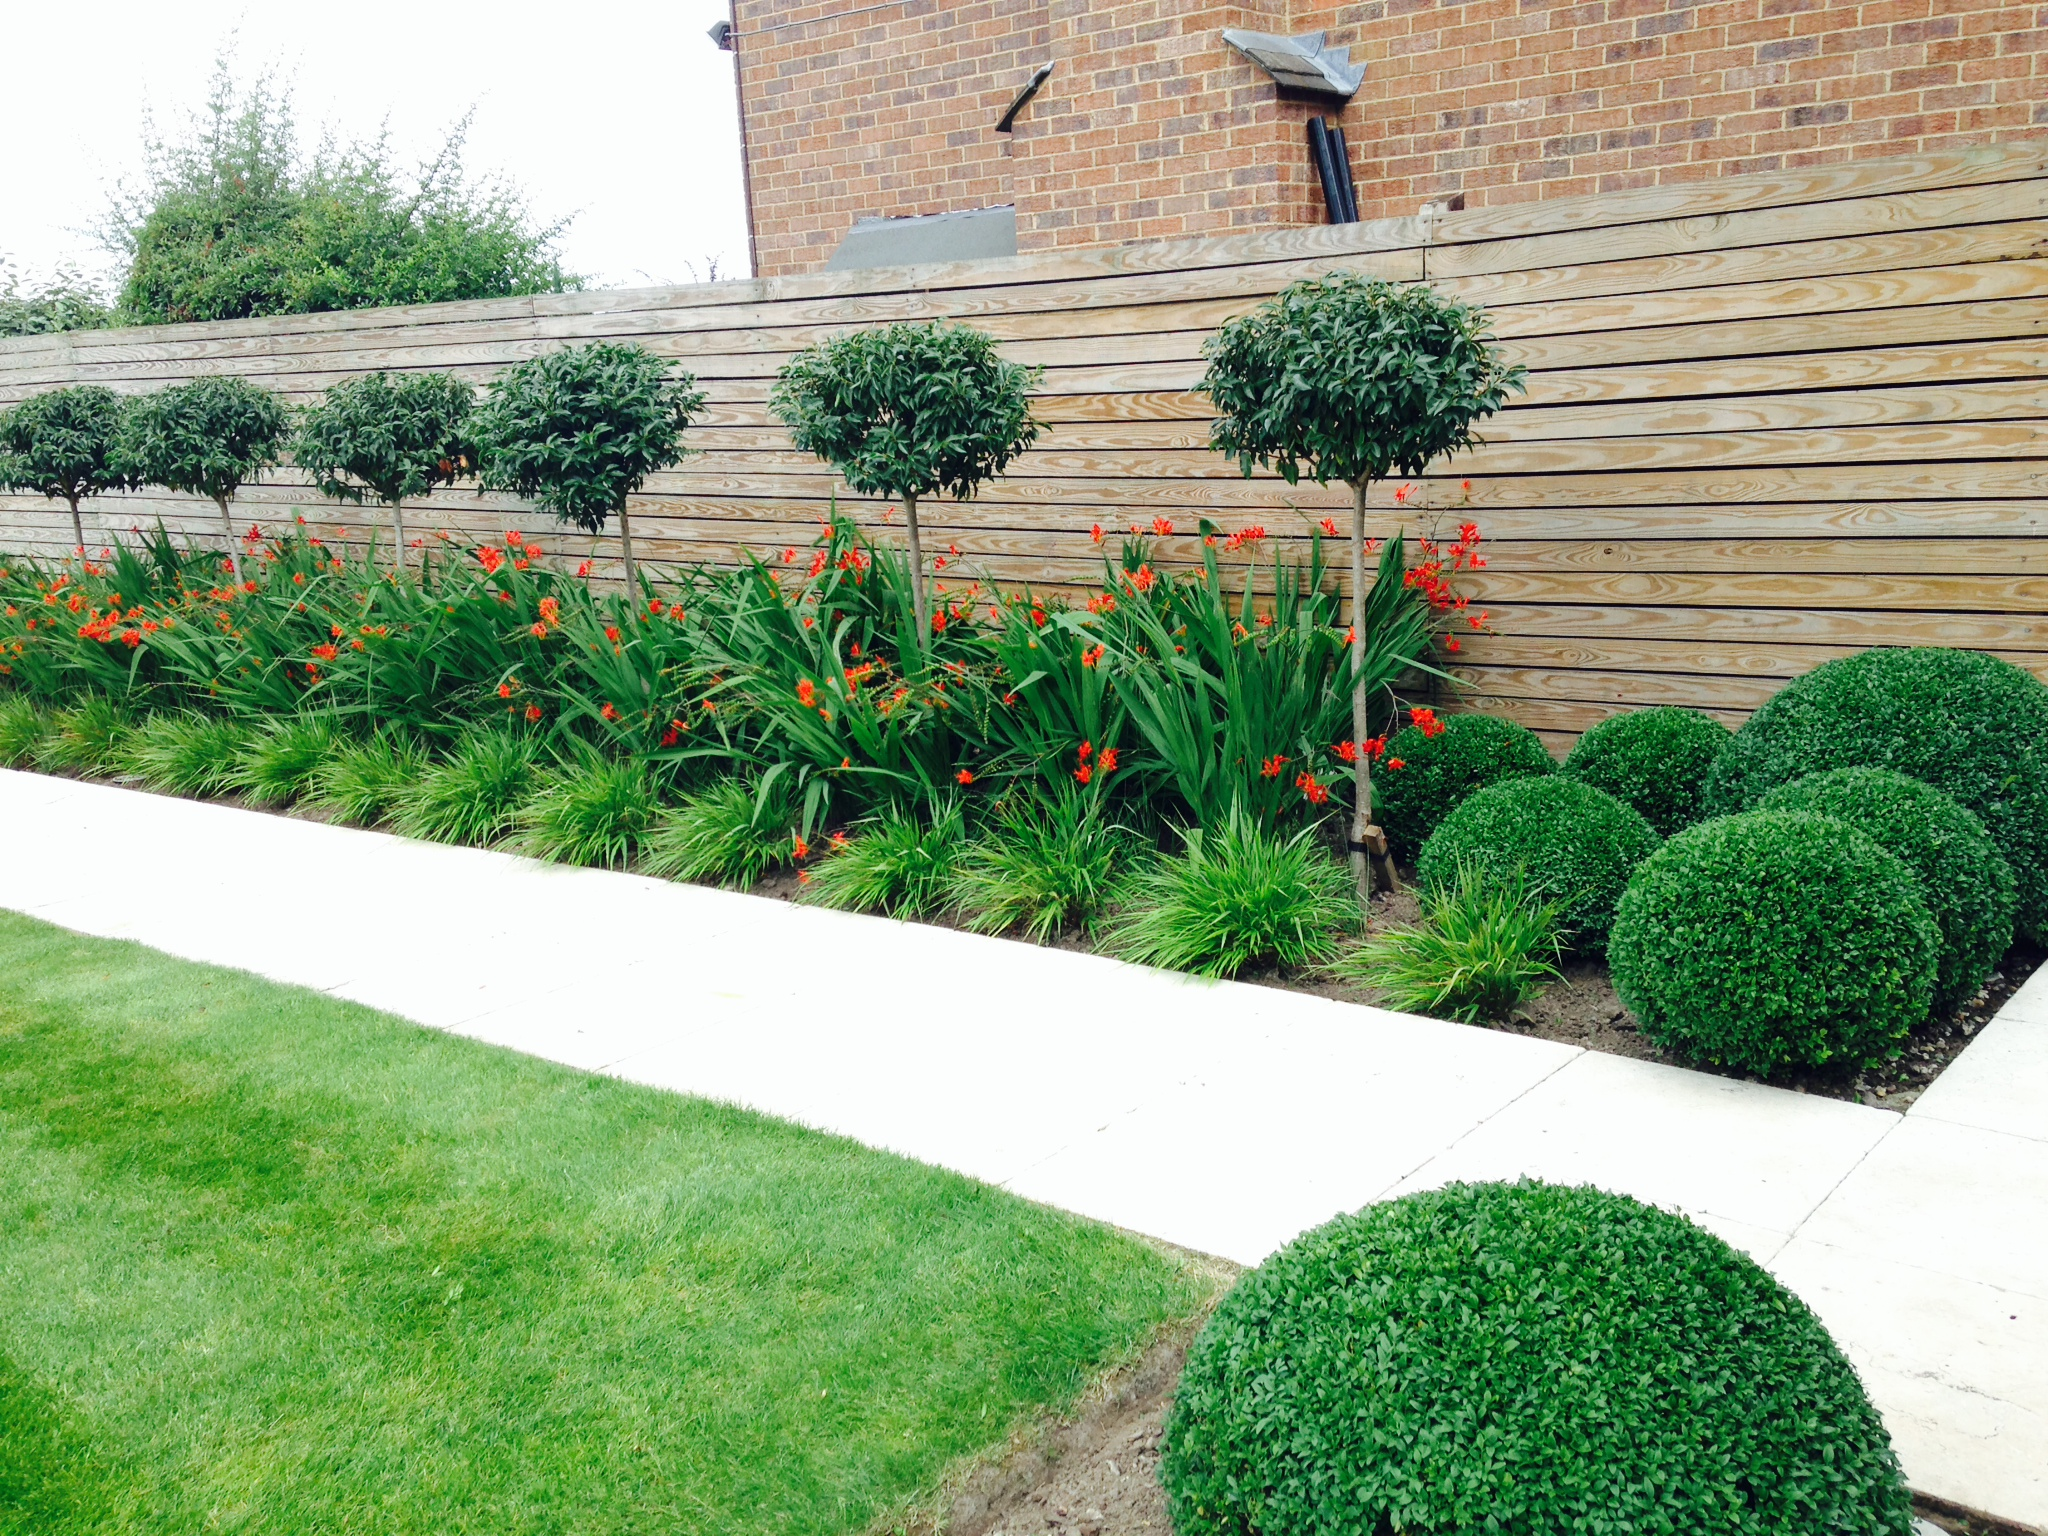 Garden Maintenance - Border Care and Topiary Maintenance